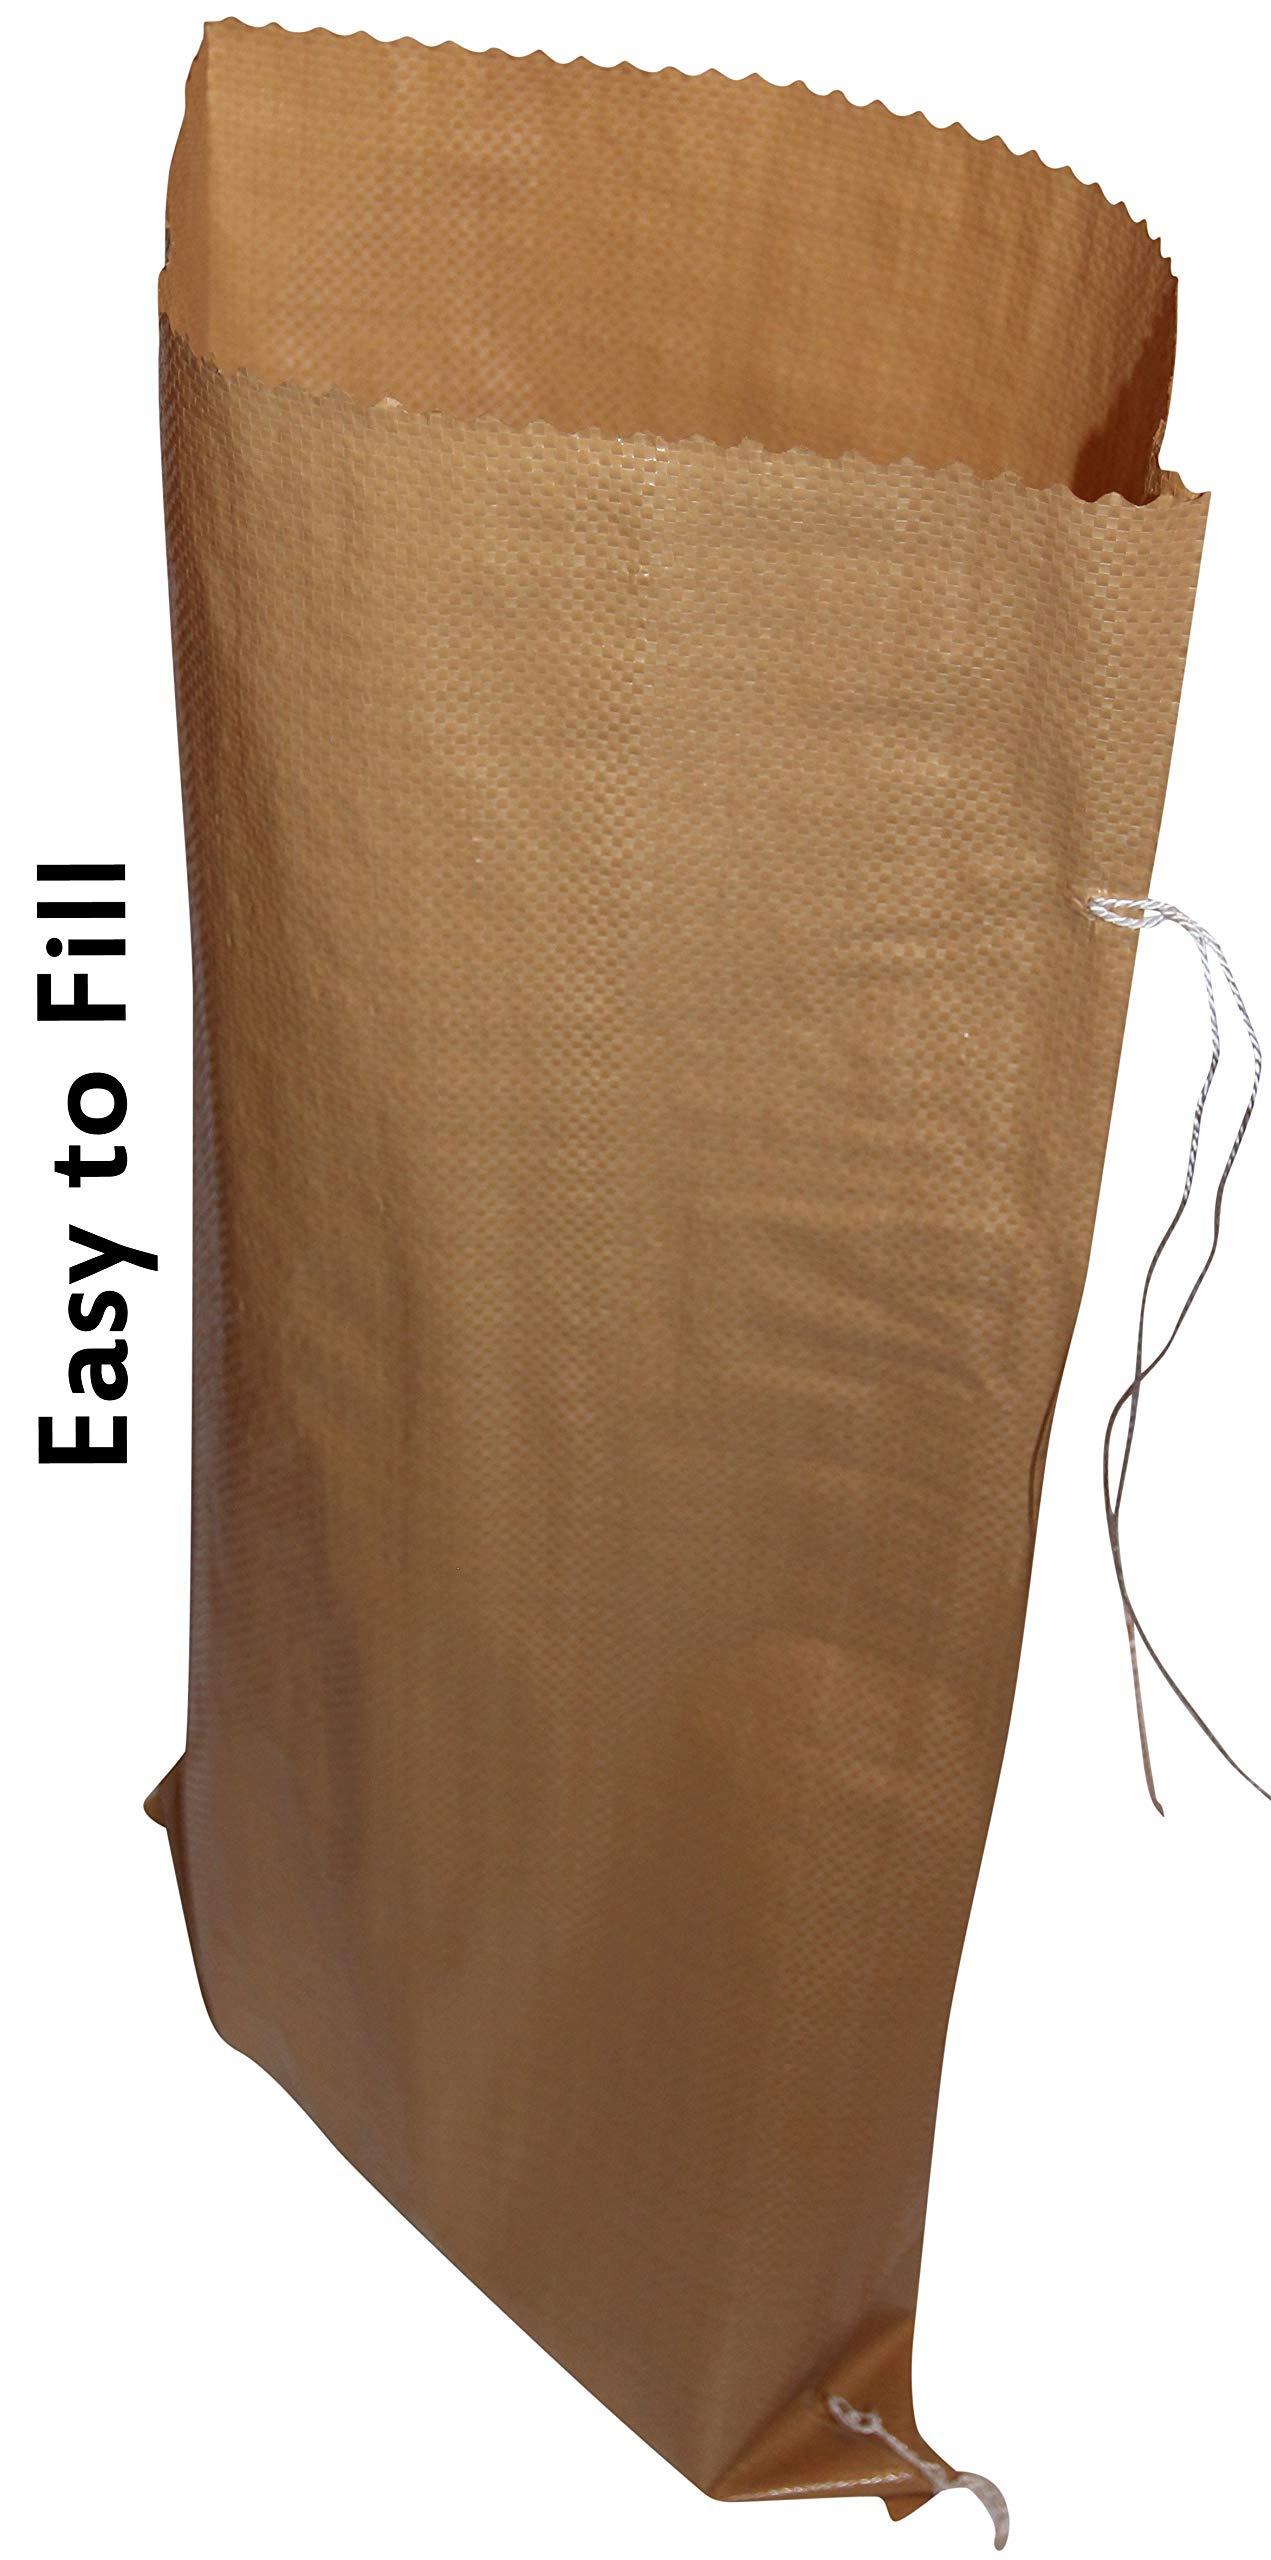 Sand Bags 14'' X 27'' Empty Woven Polypropylene Sandbags w/Ties- 1350 Denier -Tan/Earth, Heavy Duty with Enhanced UVI Protection, Waterproof, Dust Proof, (10 Bags) The Goldilocks of Sandbags by BagsOSand